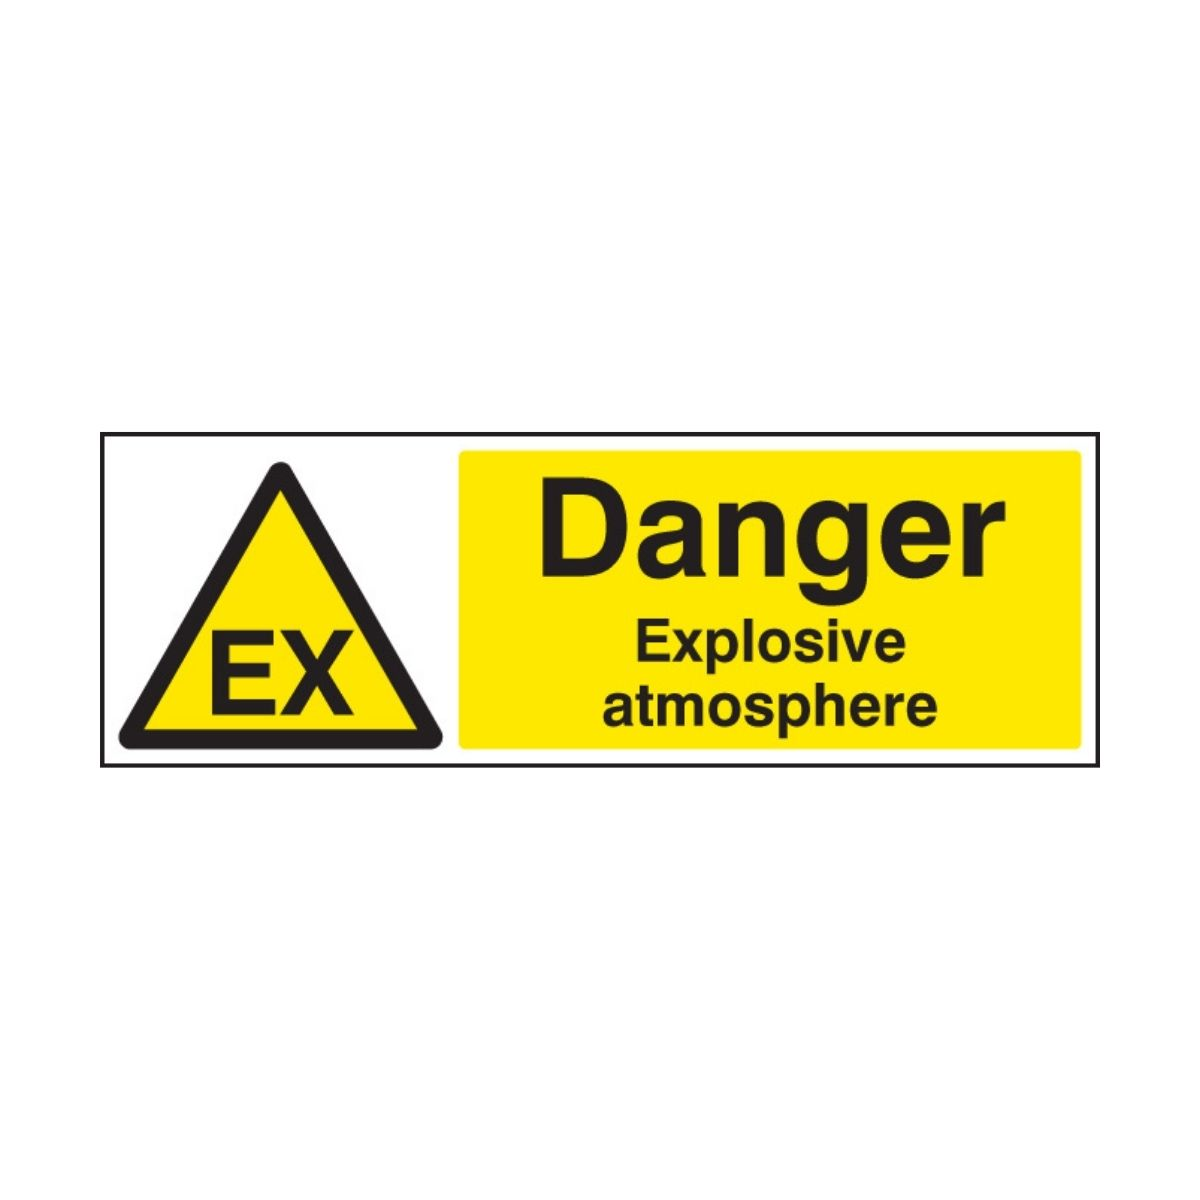 SS14479K Danger Explosive Atmosphere (400 x 300mm)